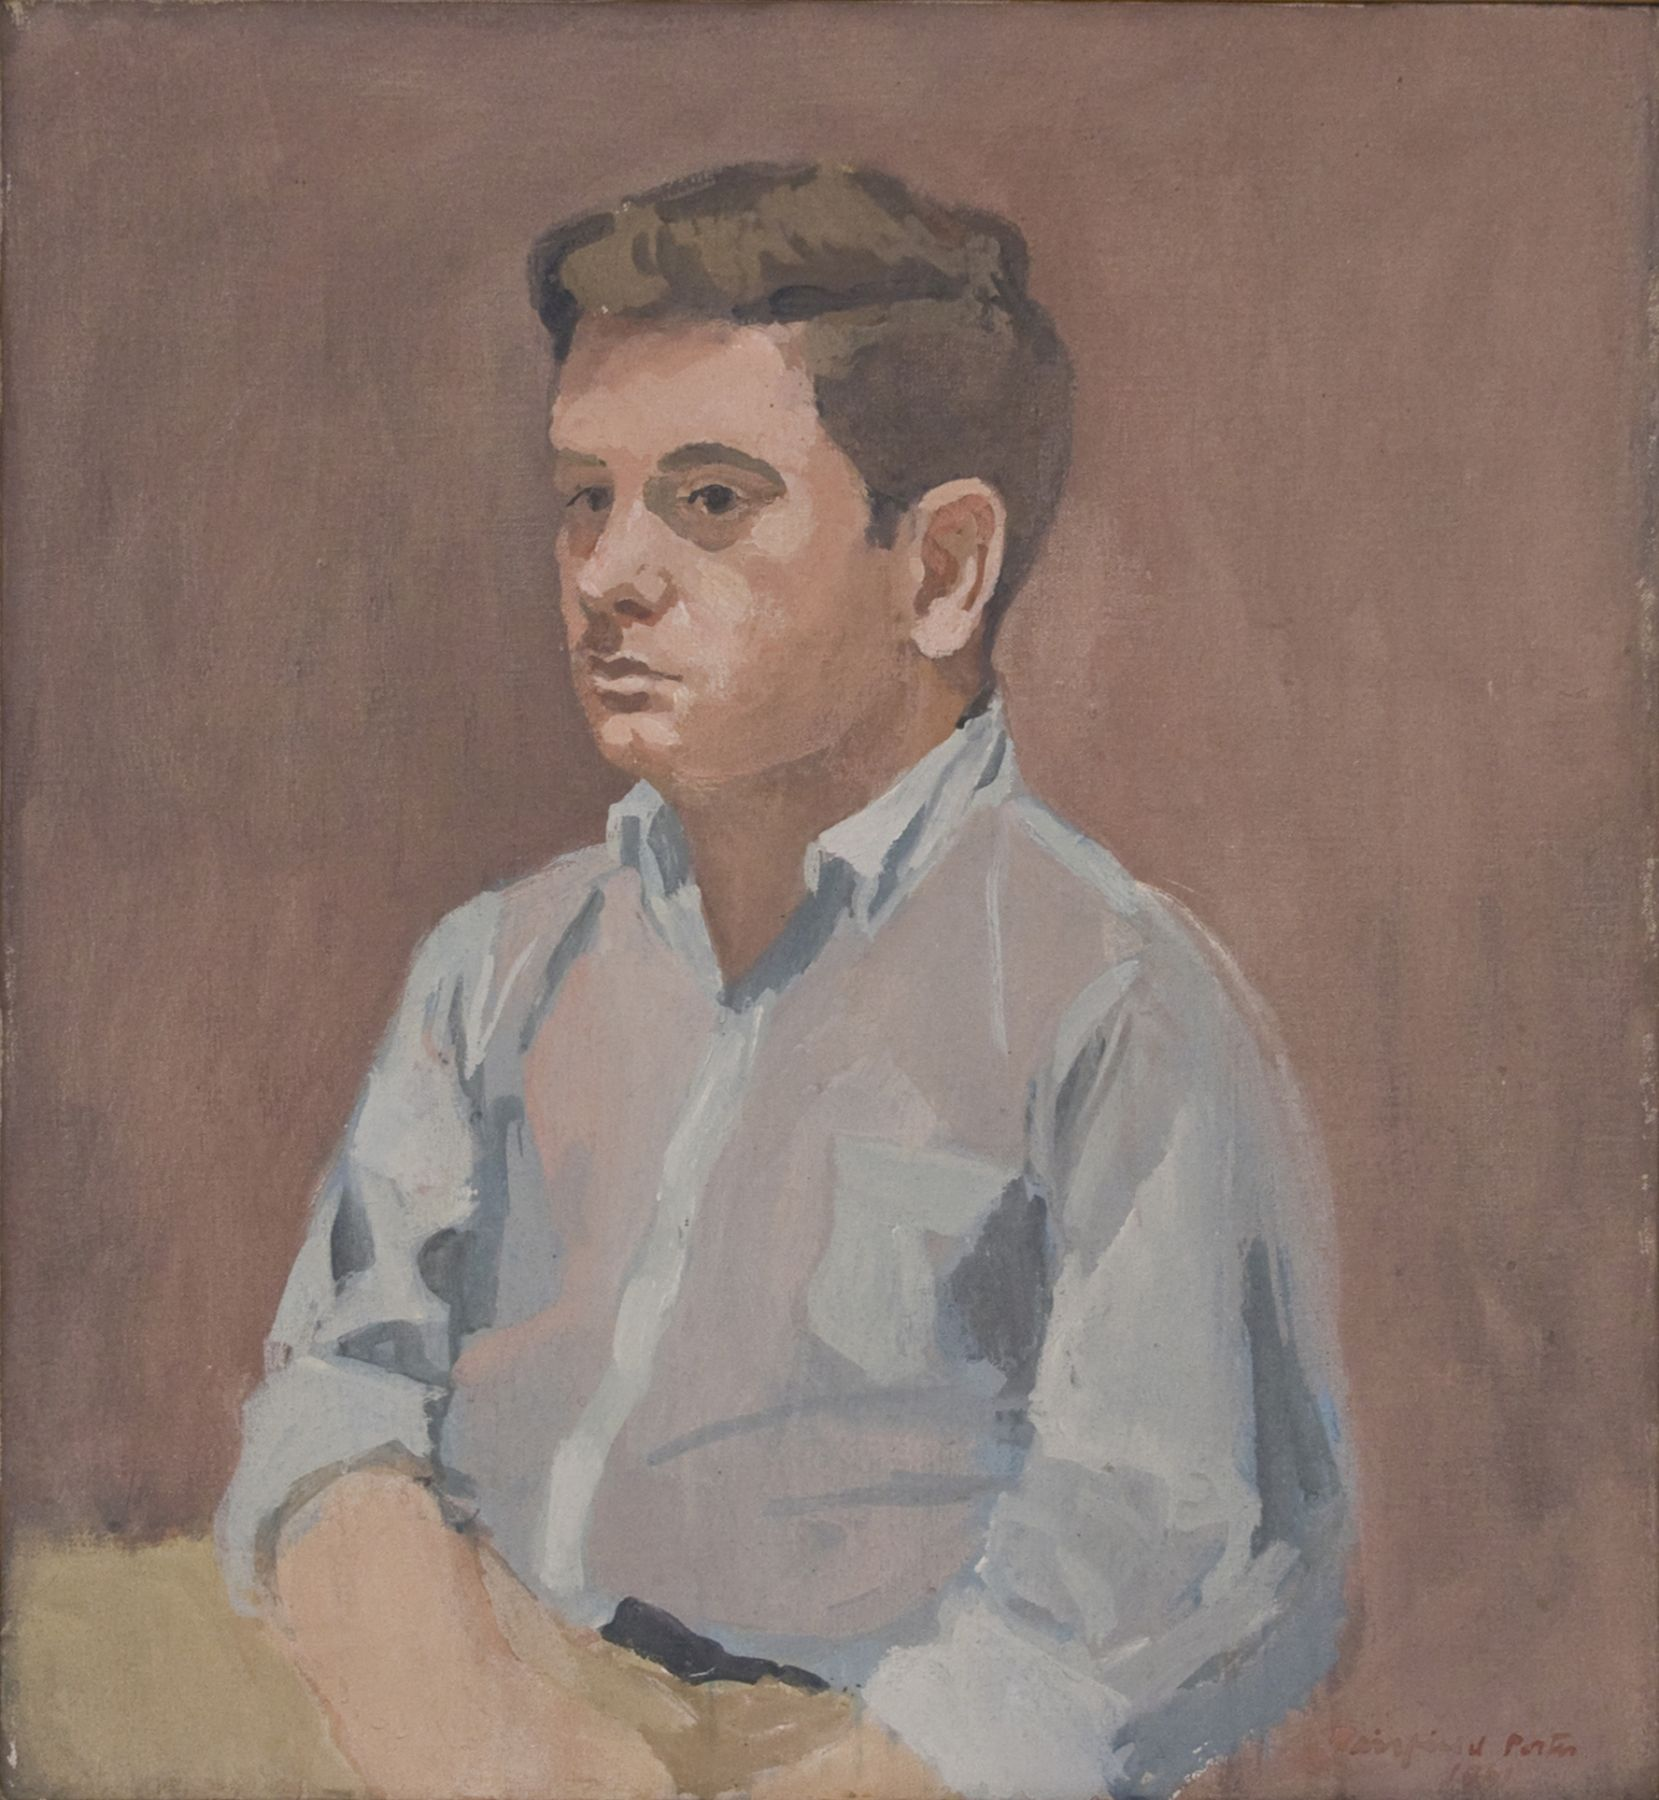 Fairfield Porter, Portrait of James Schuyler, 1961, oil on canvas, 24 x 22 inches